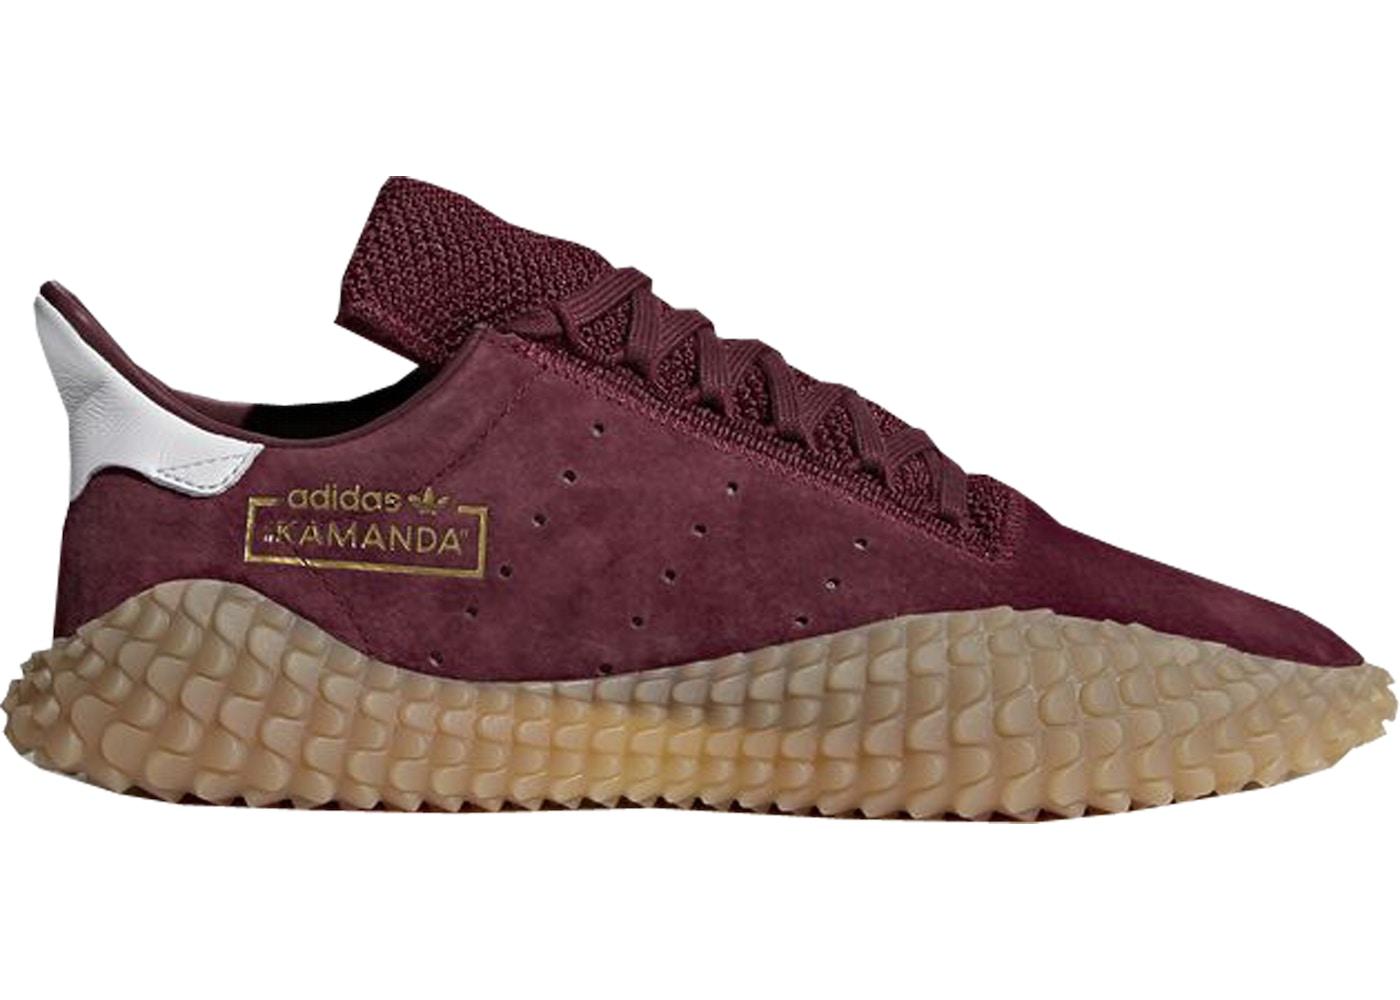 Adidas Kamanda Burgundy Gum Size 10.5